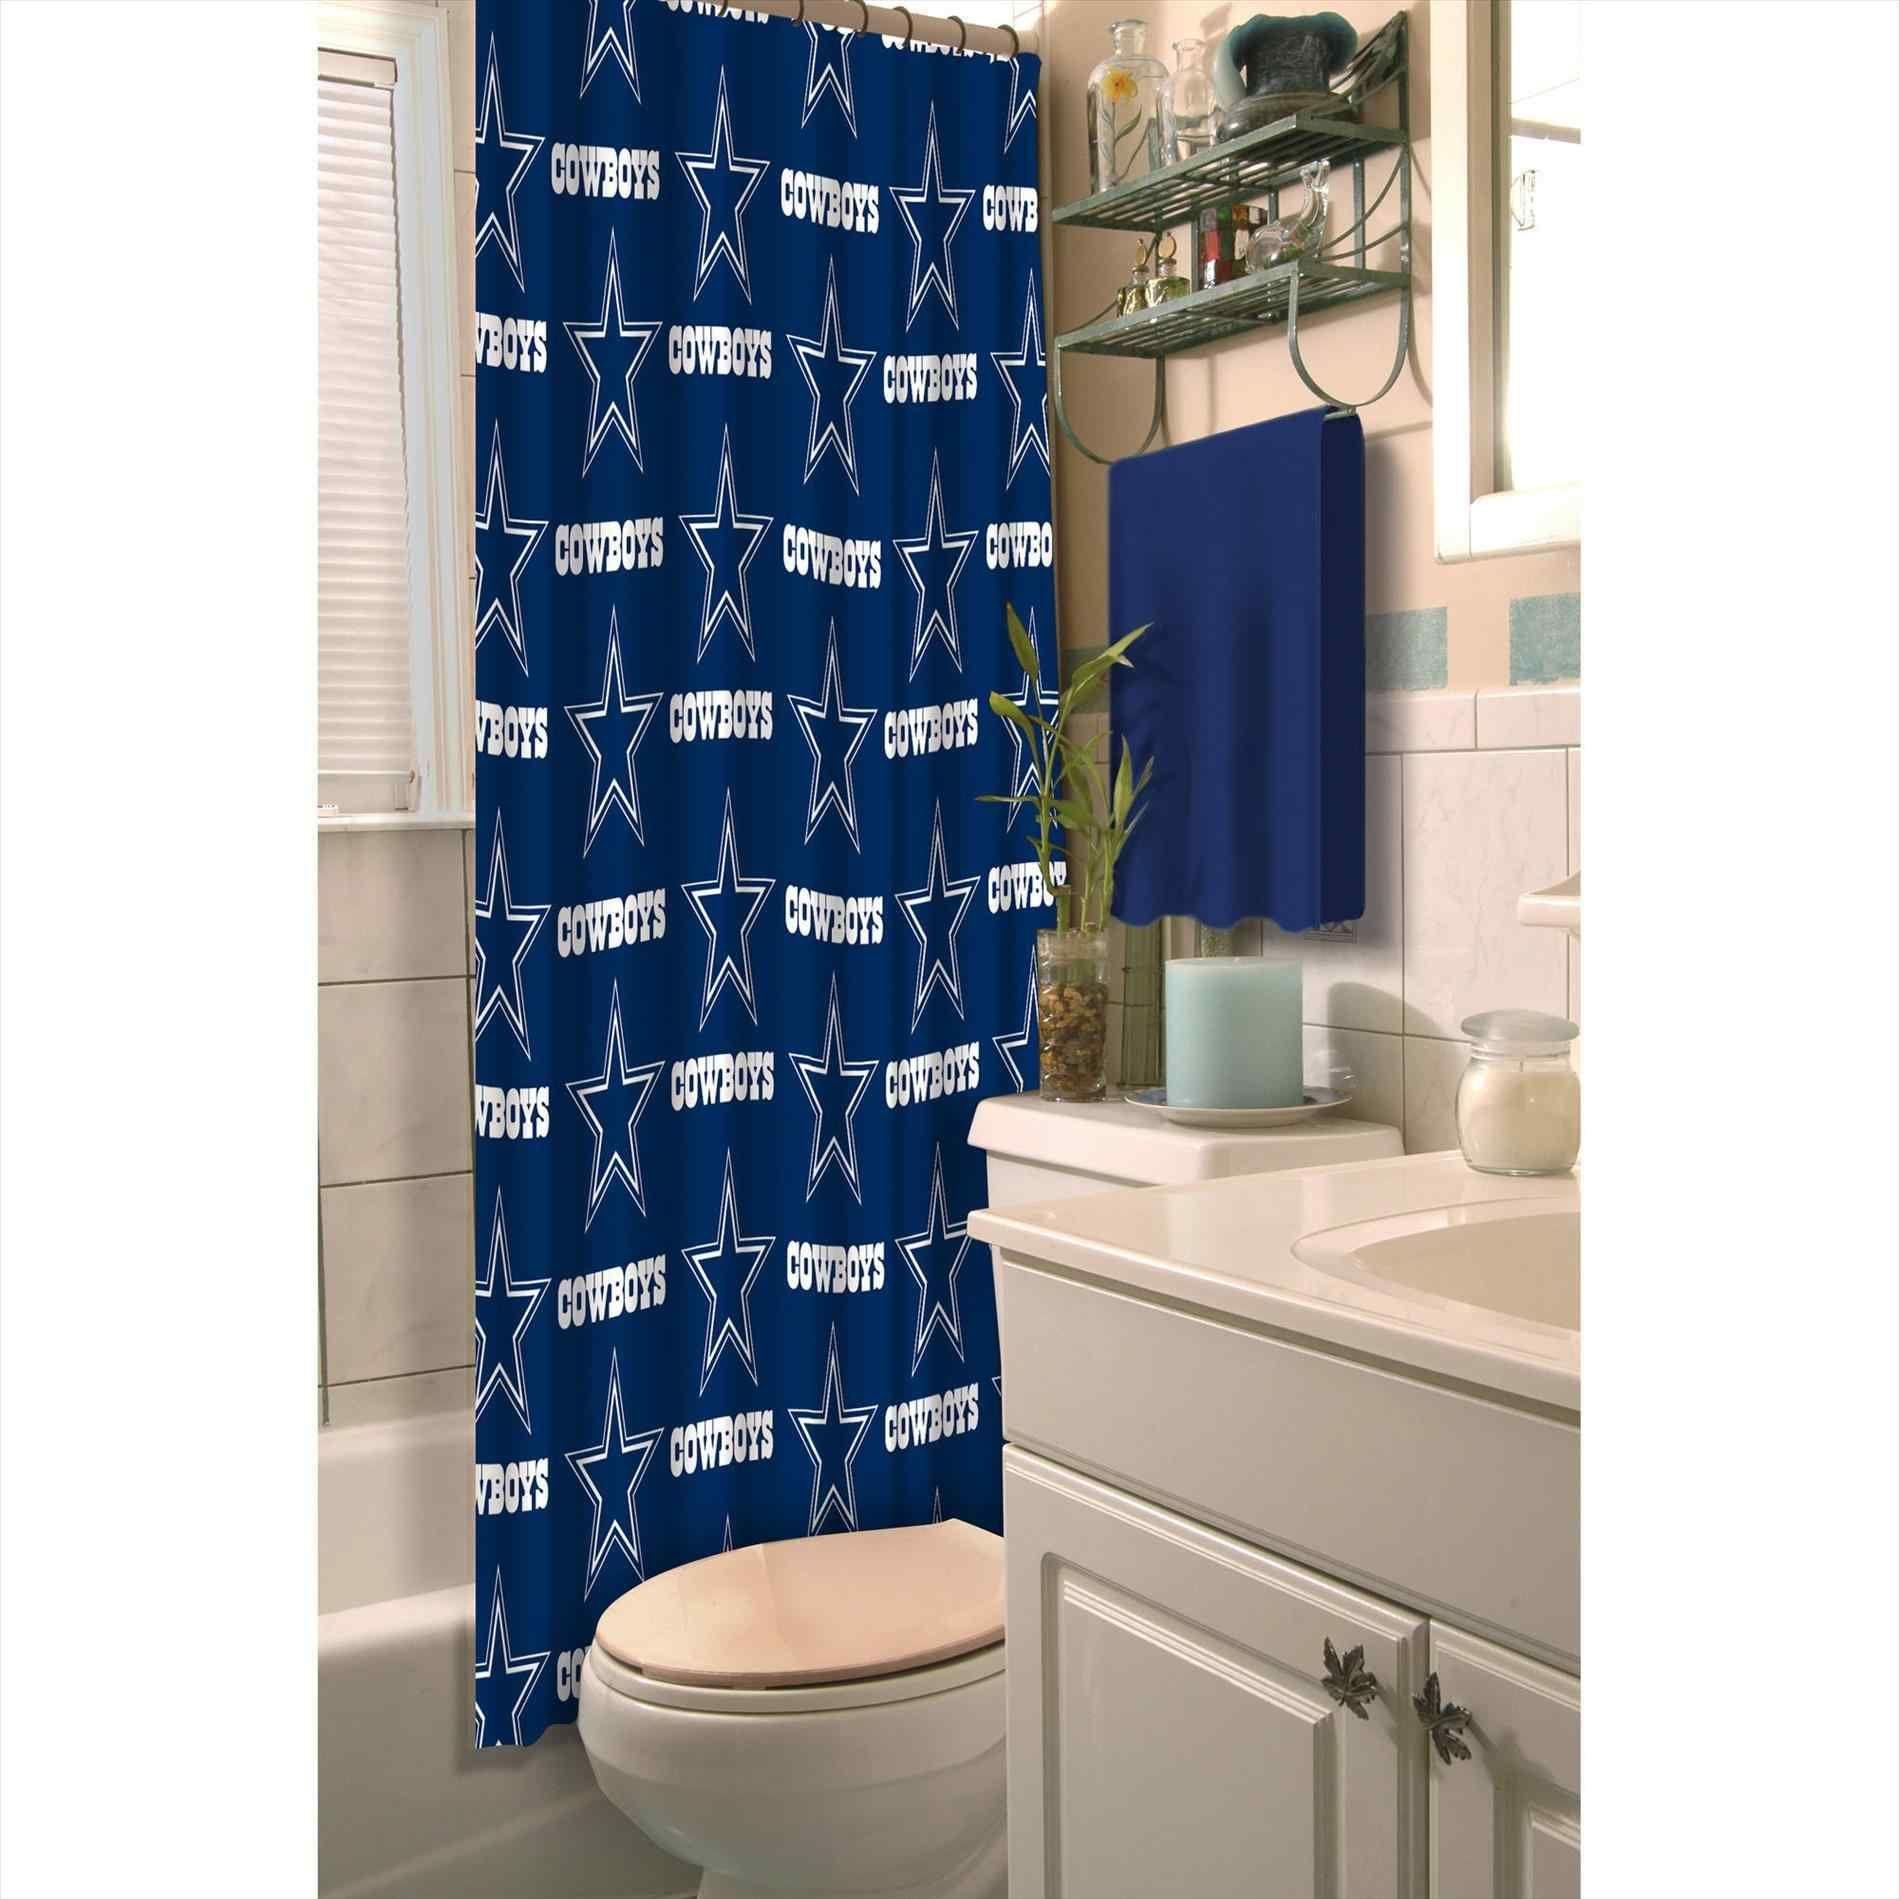 Gorgeous Bathroom Bundle Set You Need To Have | Single sink vanity ...